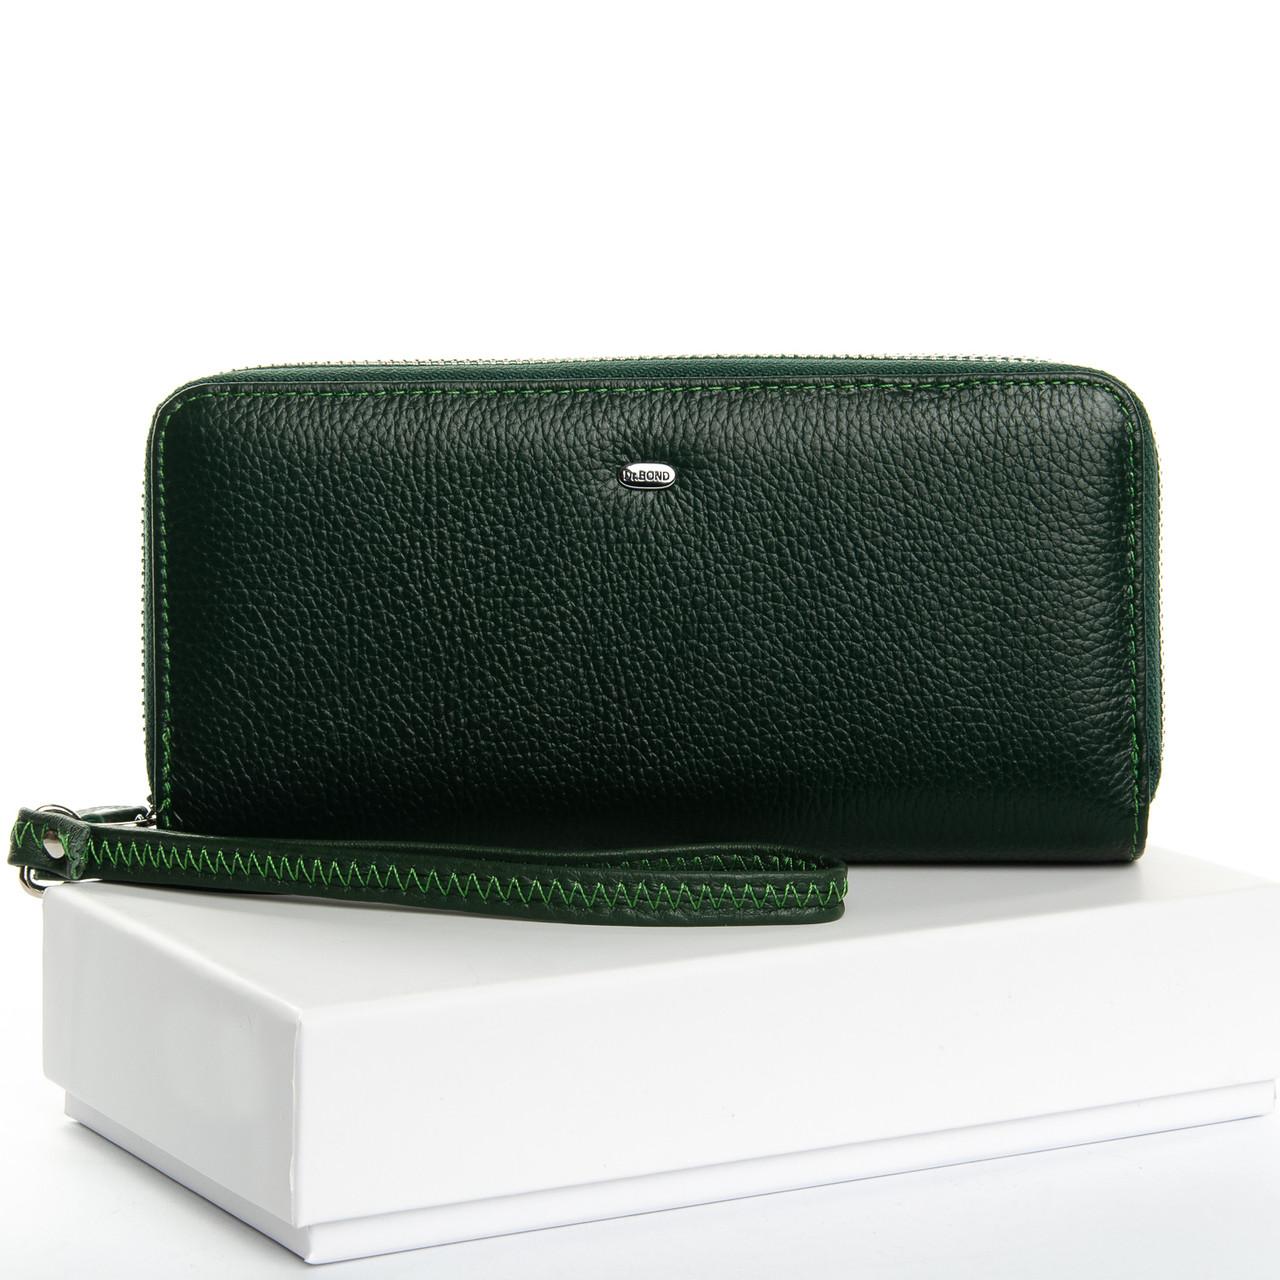 Кошелек Classic кожа DR. BOND W39-3 темно-зеленый